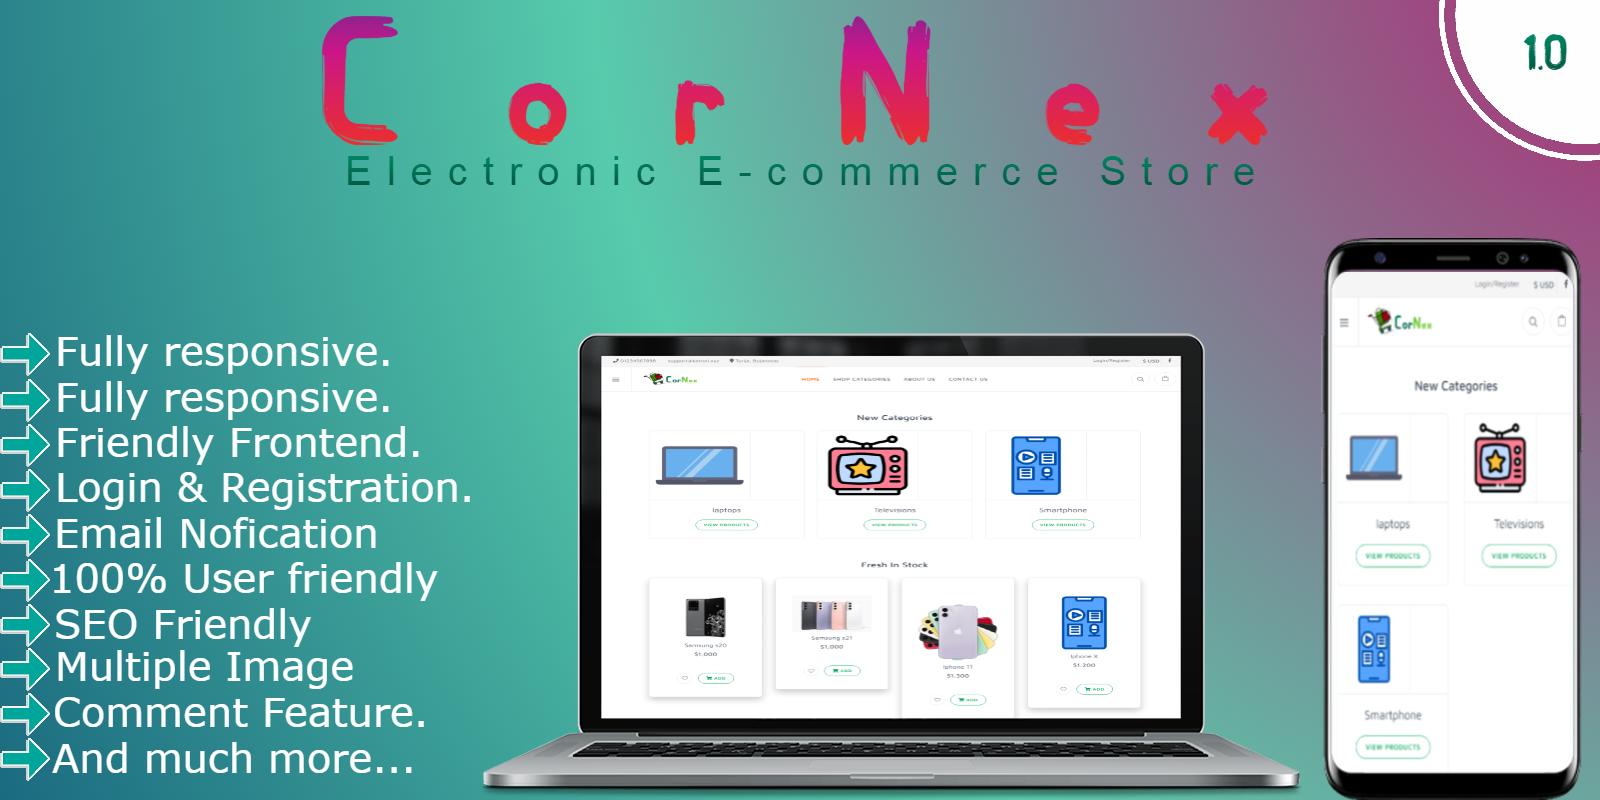 CorNex - Electronic E-commerce Store